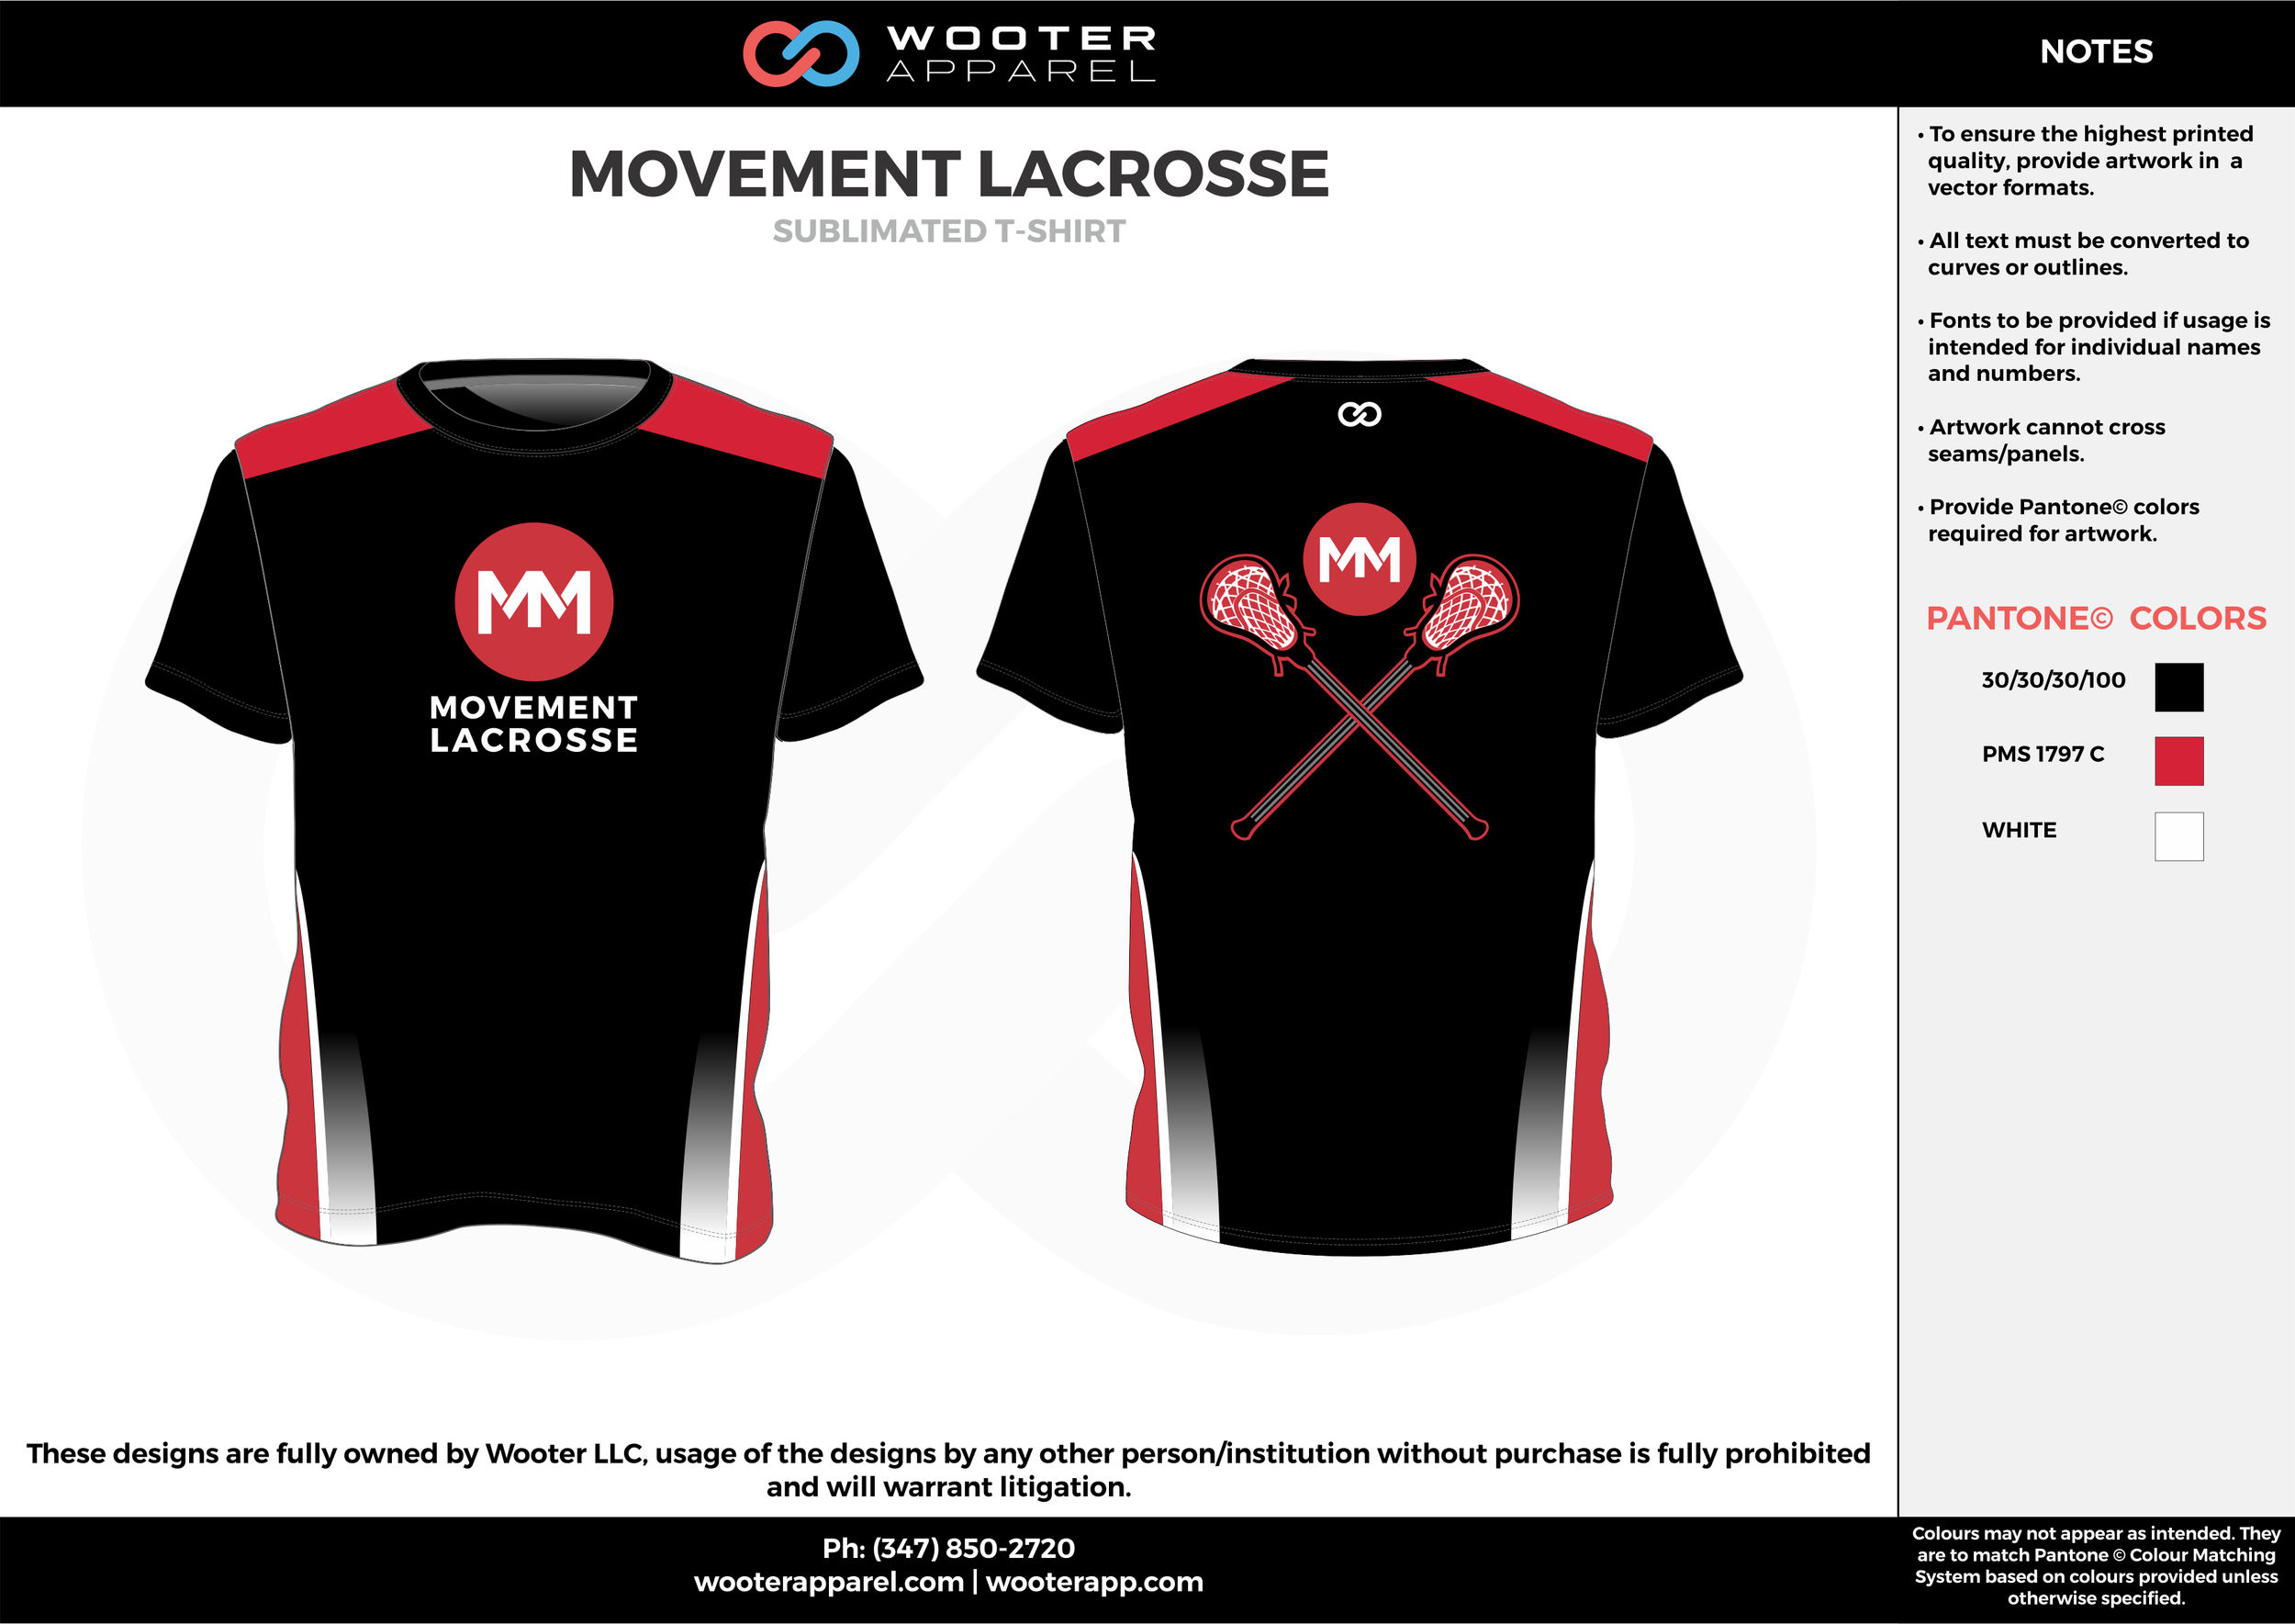 MOVEMENT LACROSSE black red white custom design t-shirts